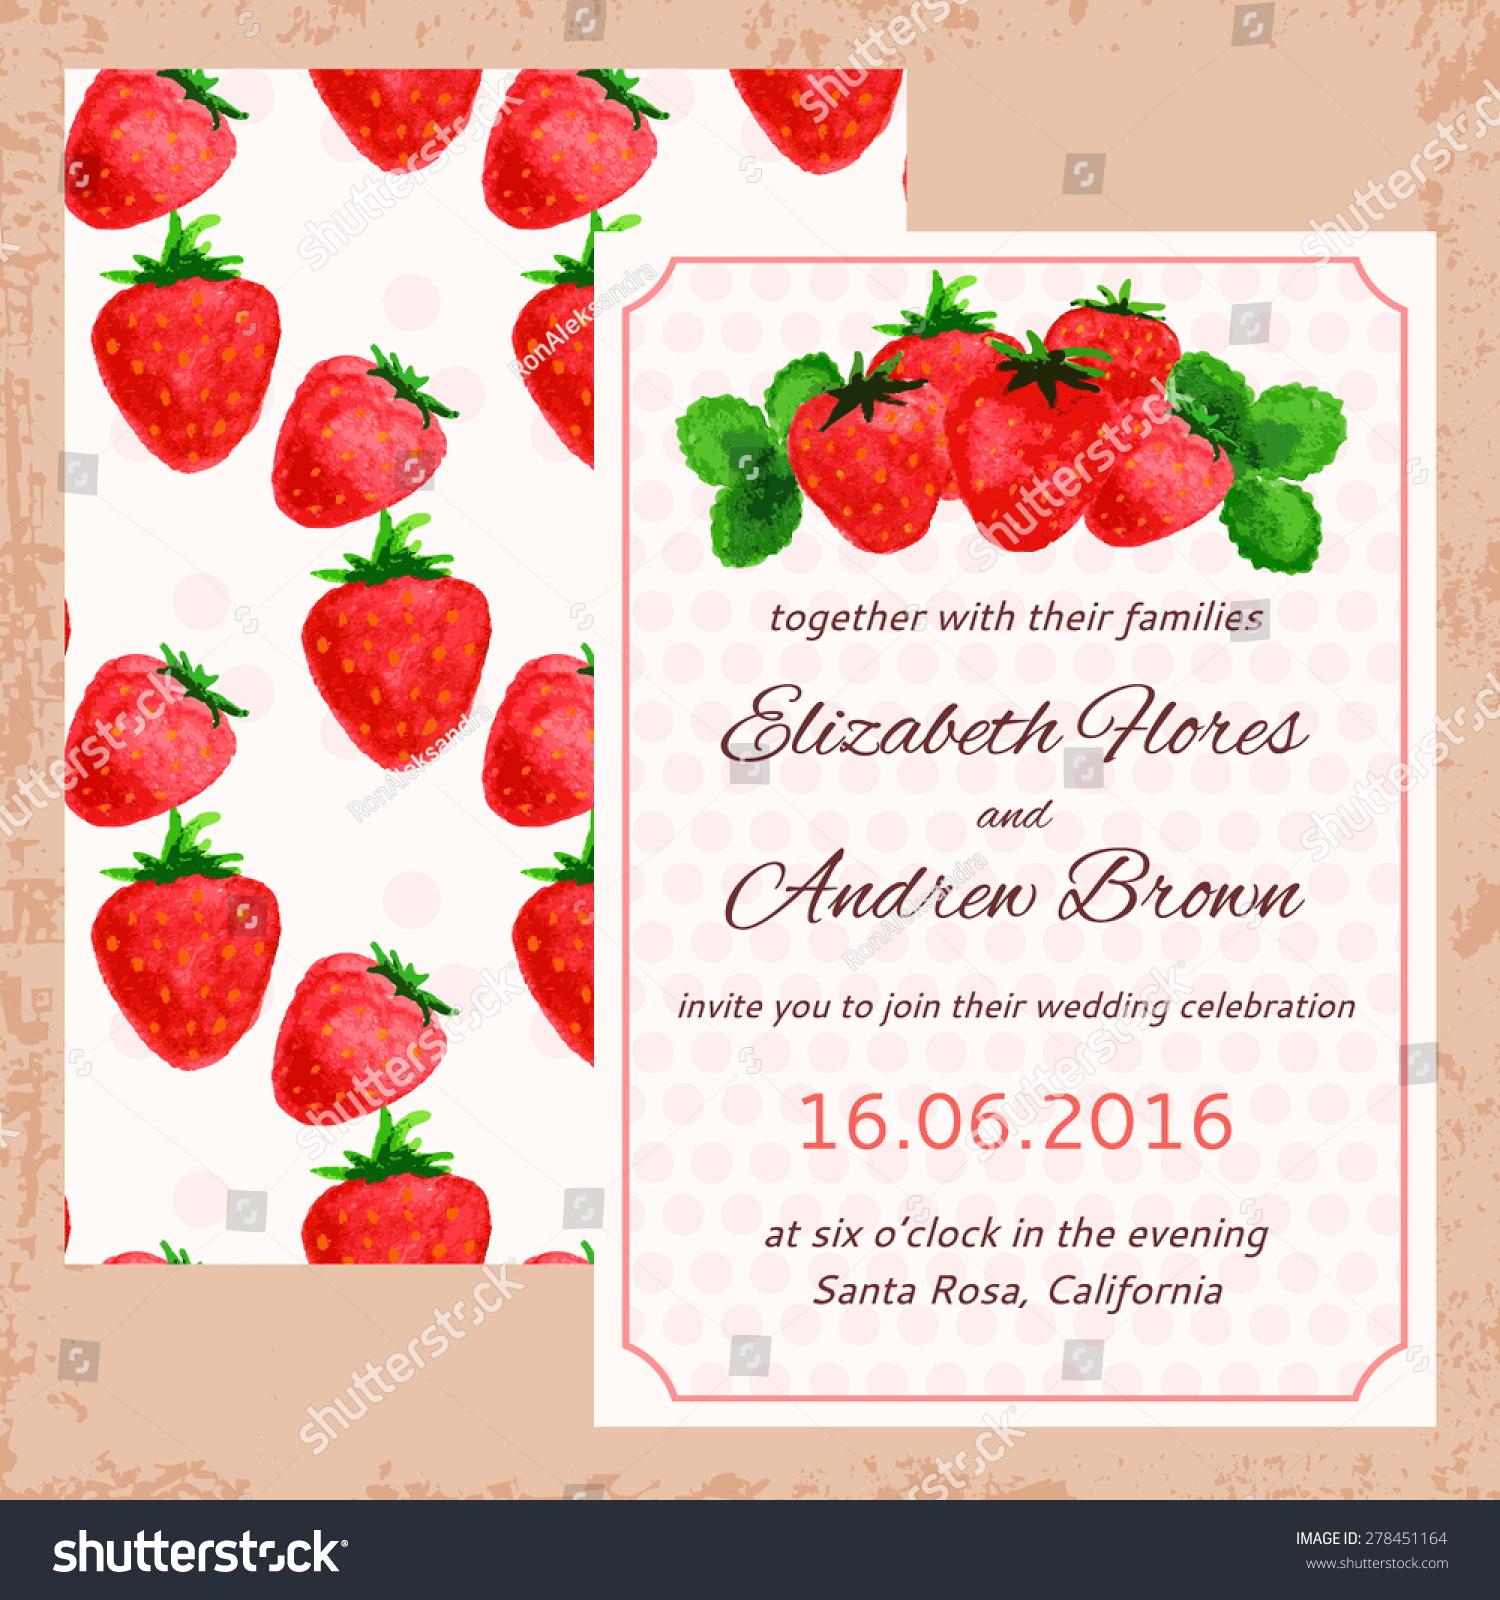 Vector Wedding Invitation Watercolor Strawberries Seamless Stock ...